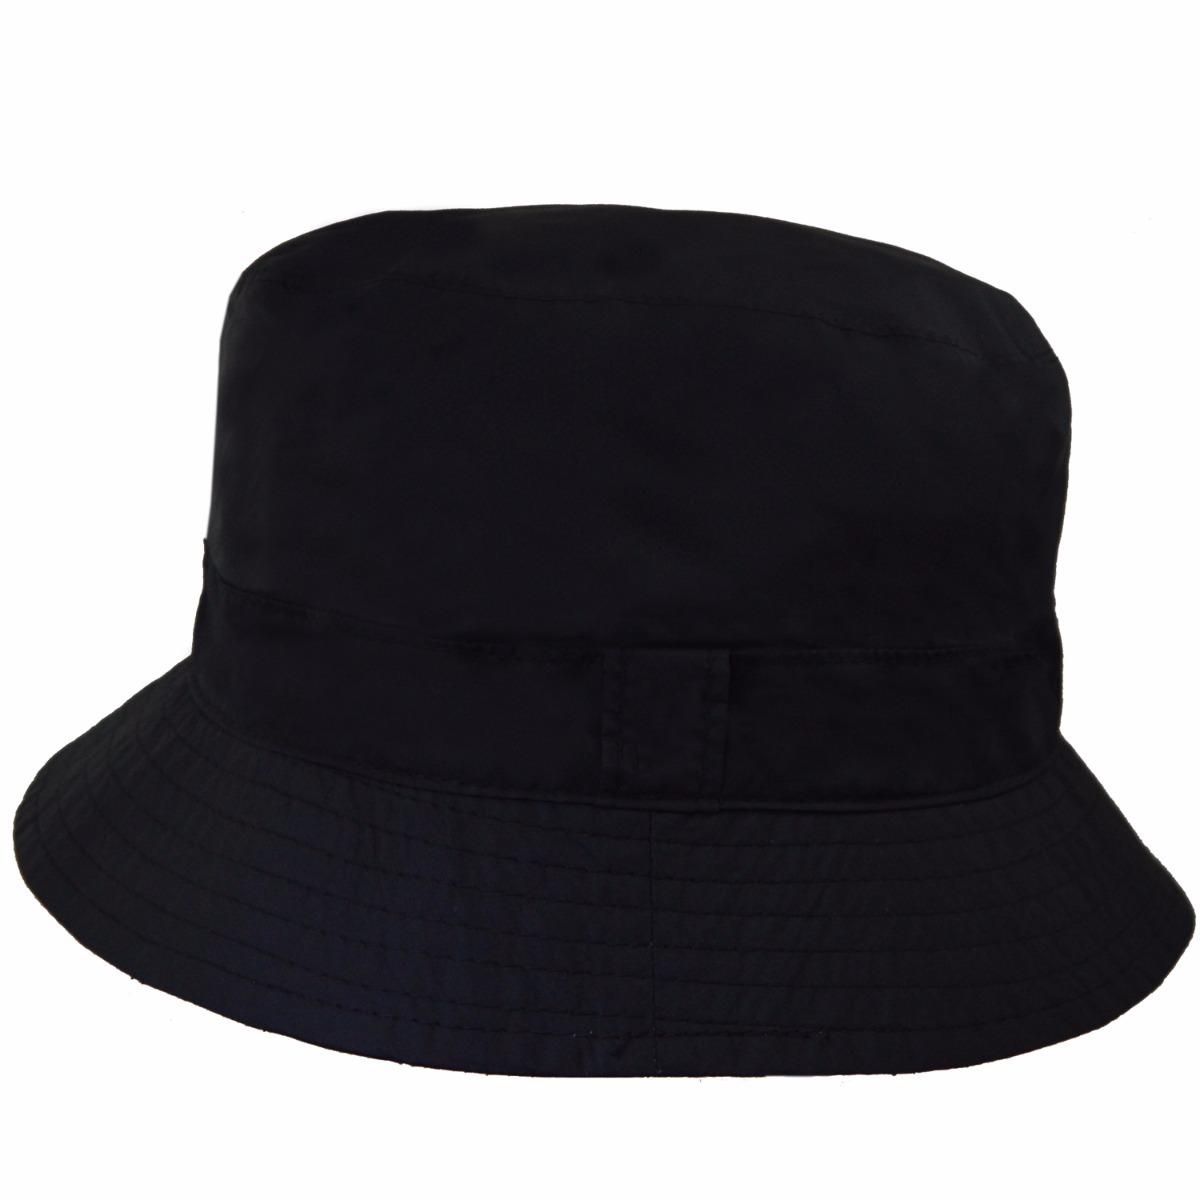 sombrero human sarge lluvia compañia de sombreros 712202. Cargando zoom. d3ec0b7b2a0e